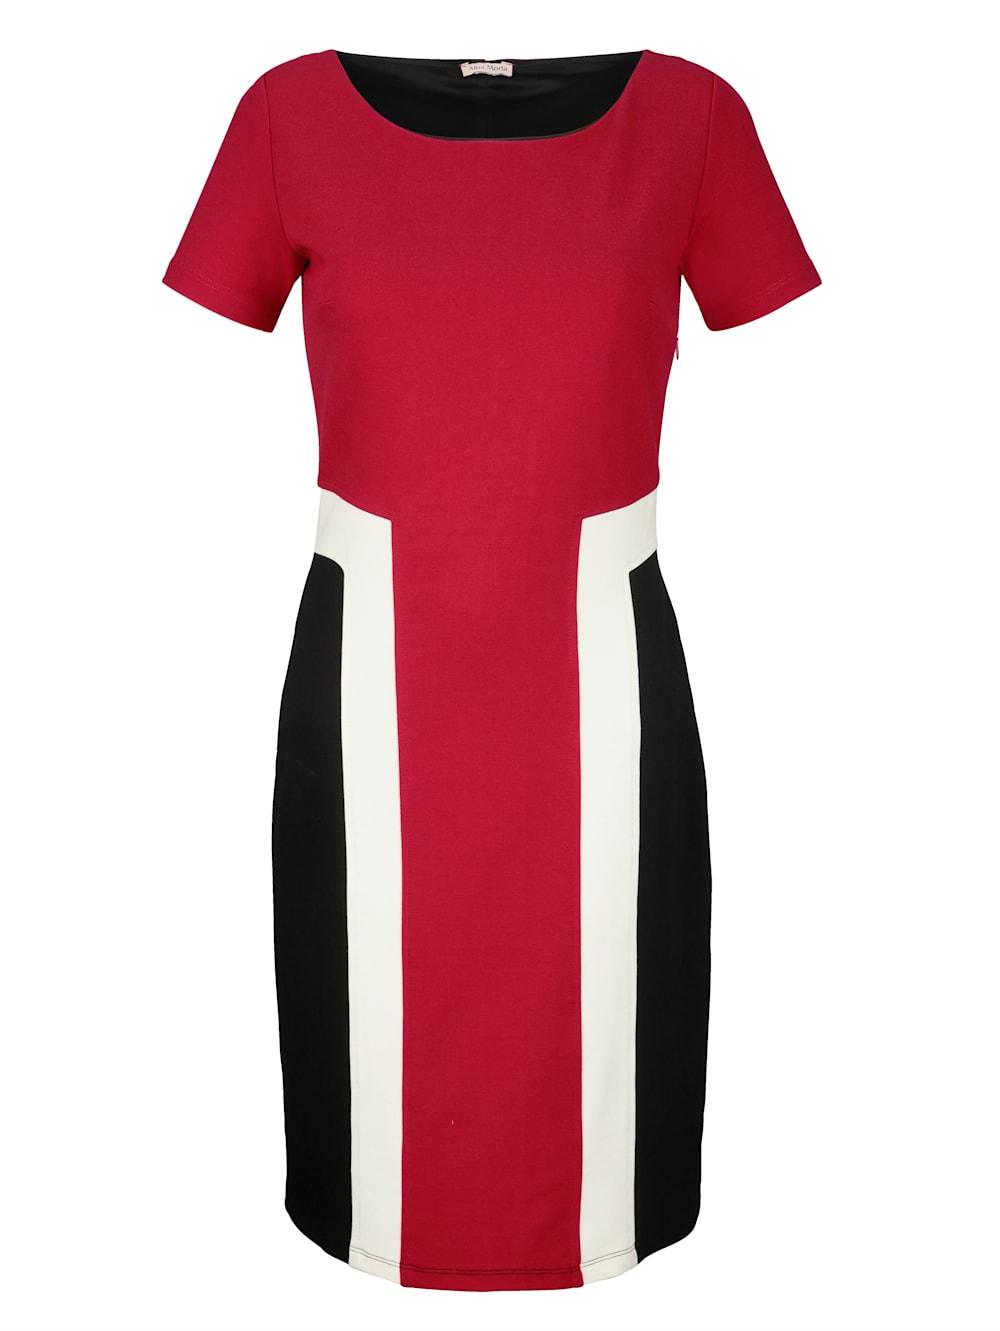 alba moda kleid in colour-blocking | alba moda